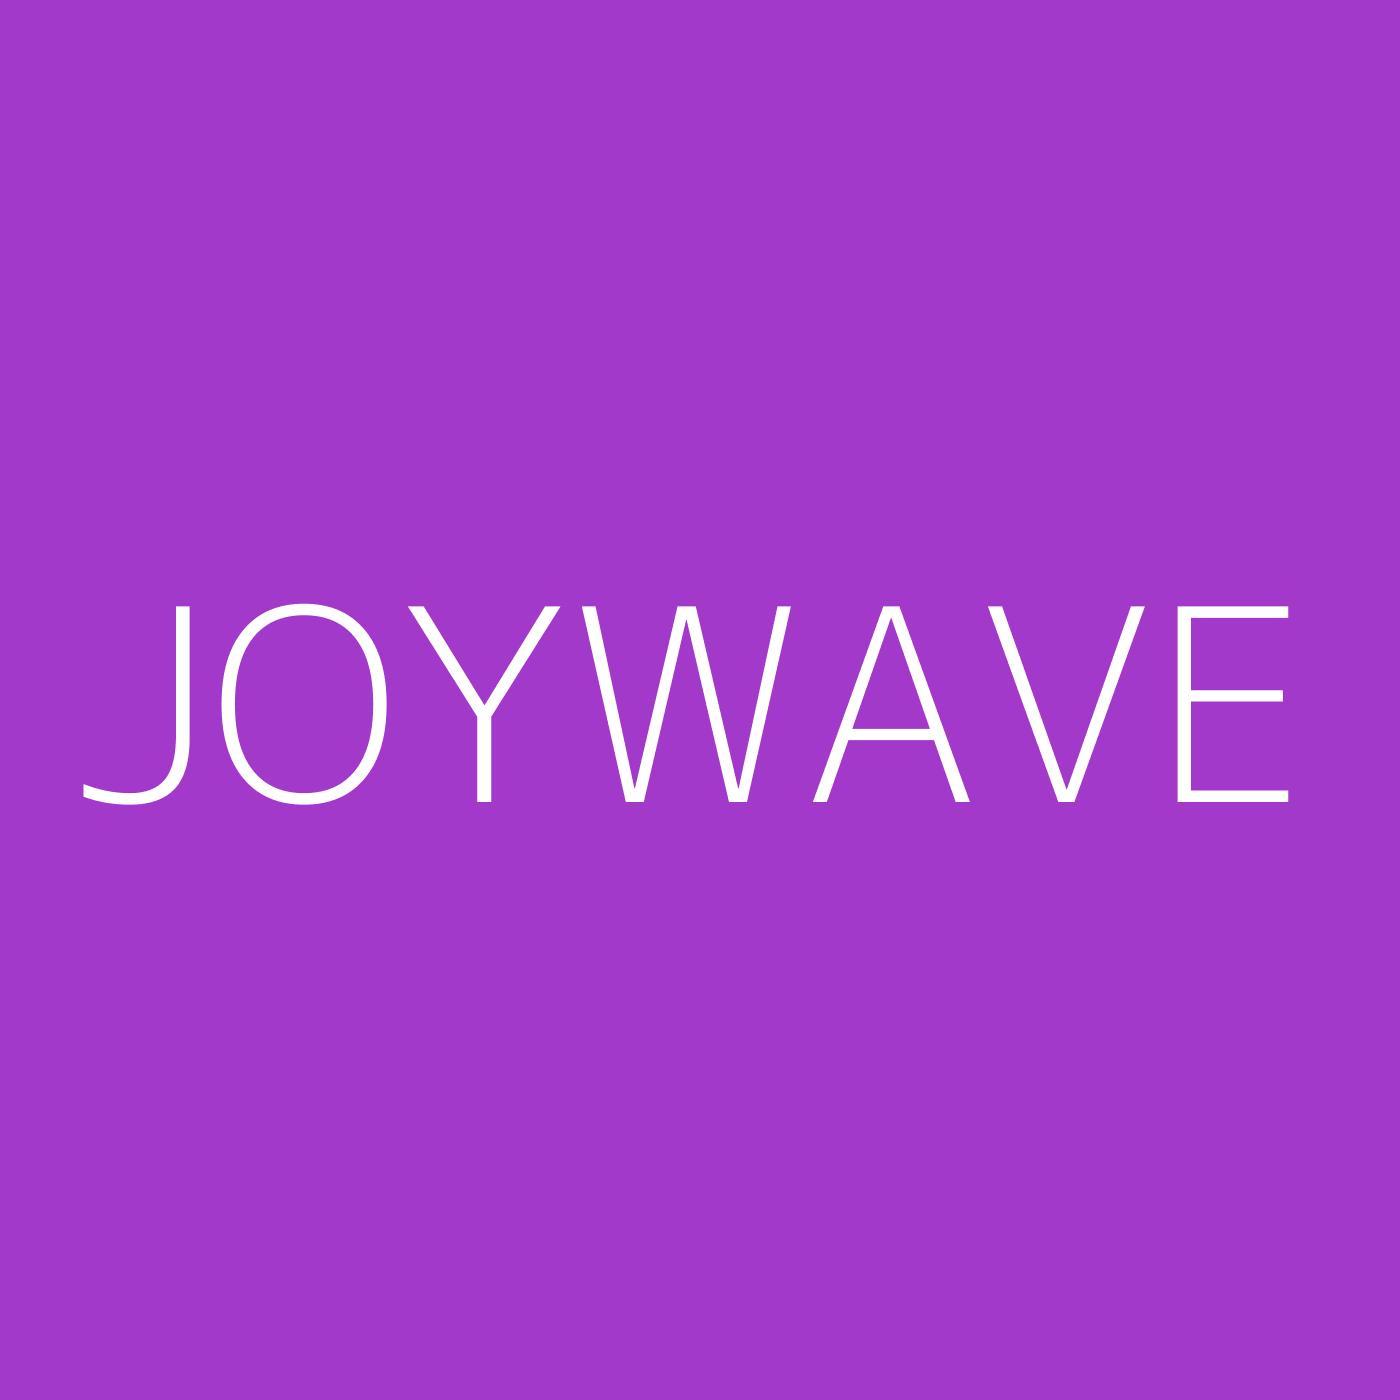 Joywave Playlist Artwork